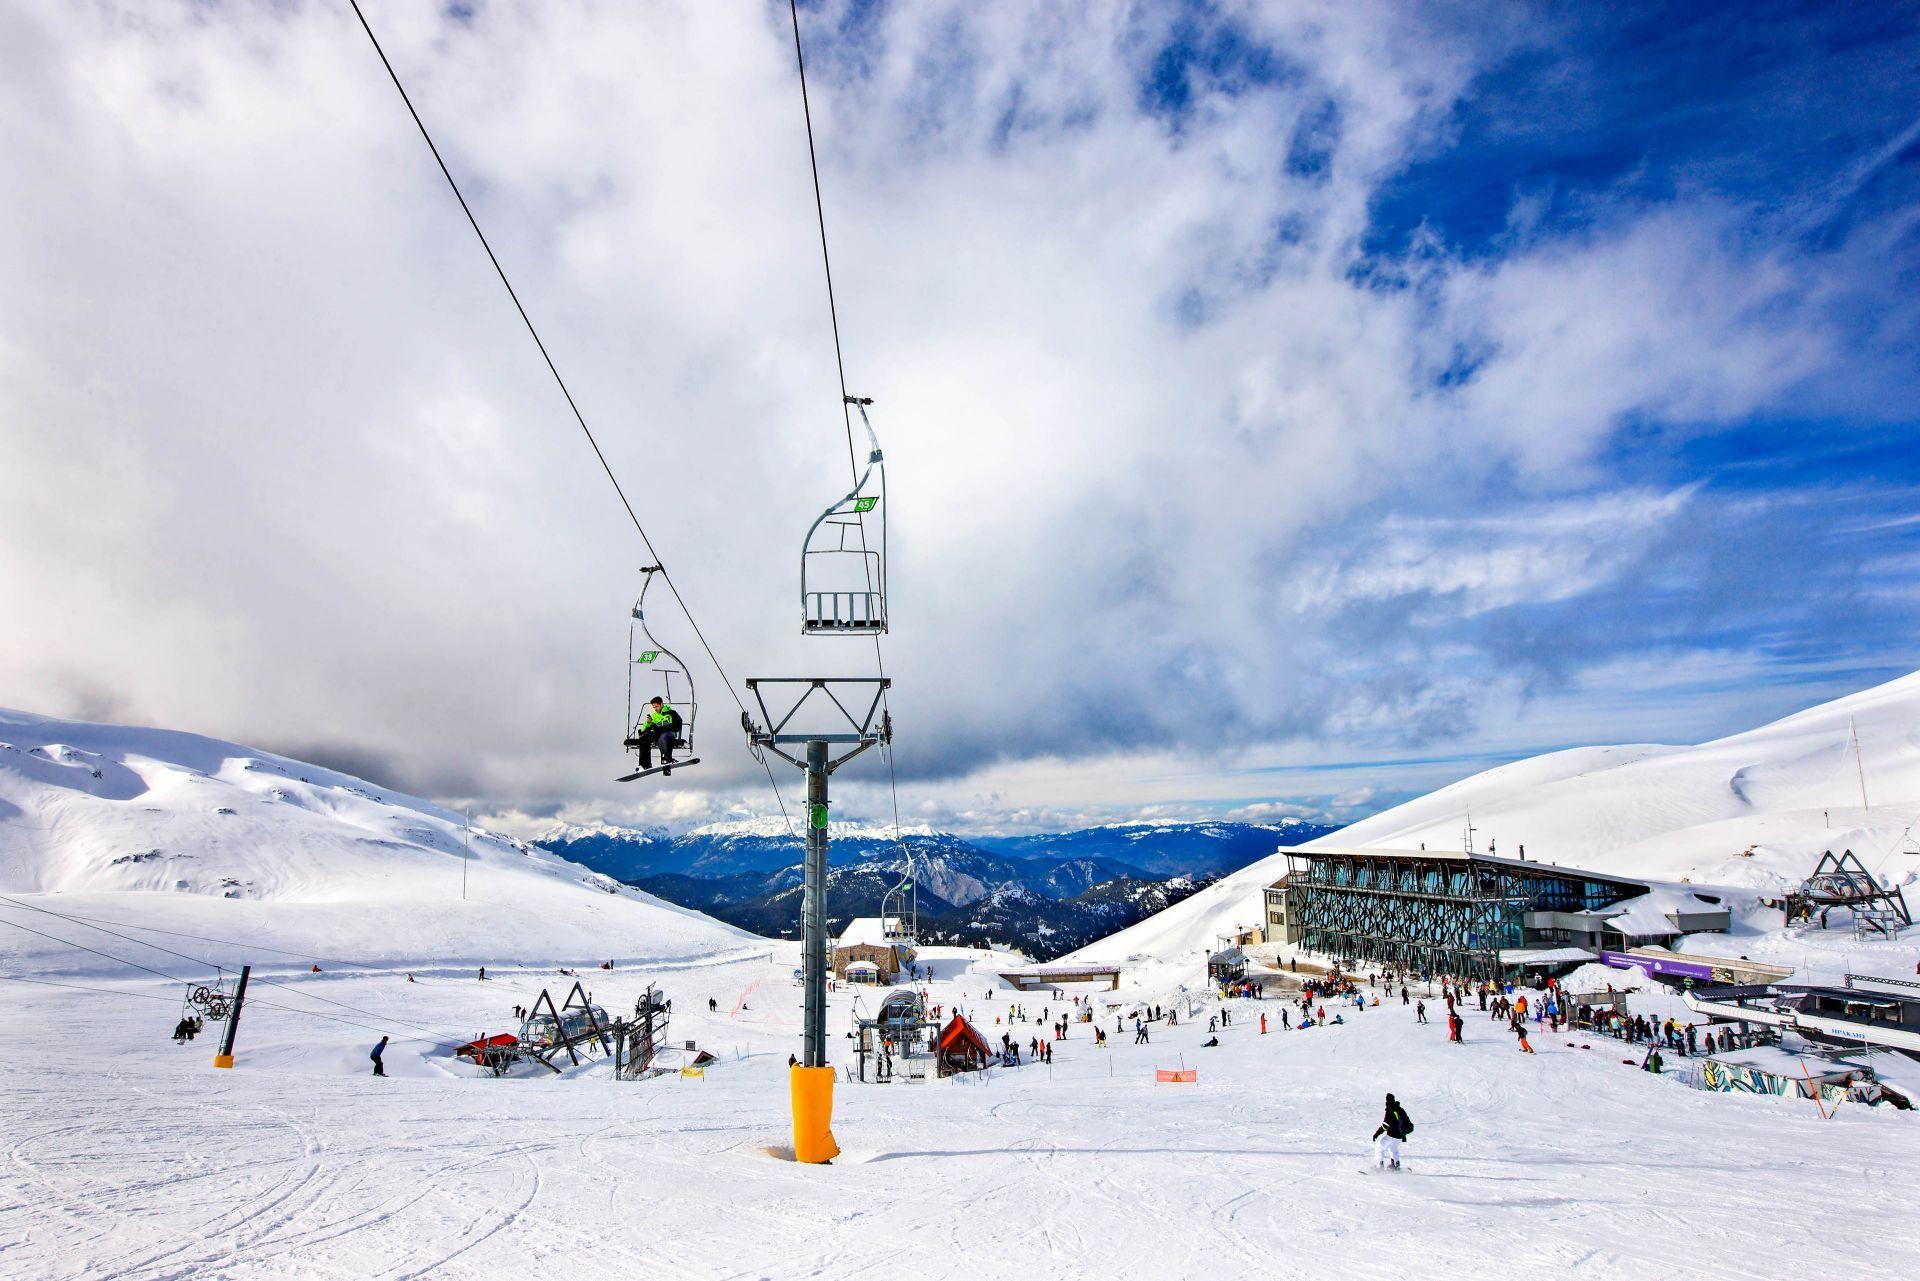 Arachova: Skiing and winter sports